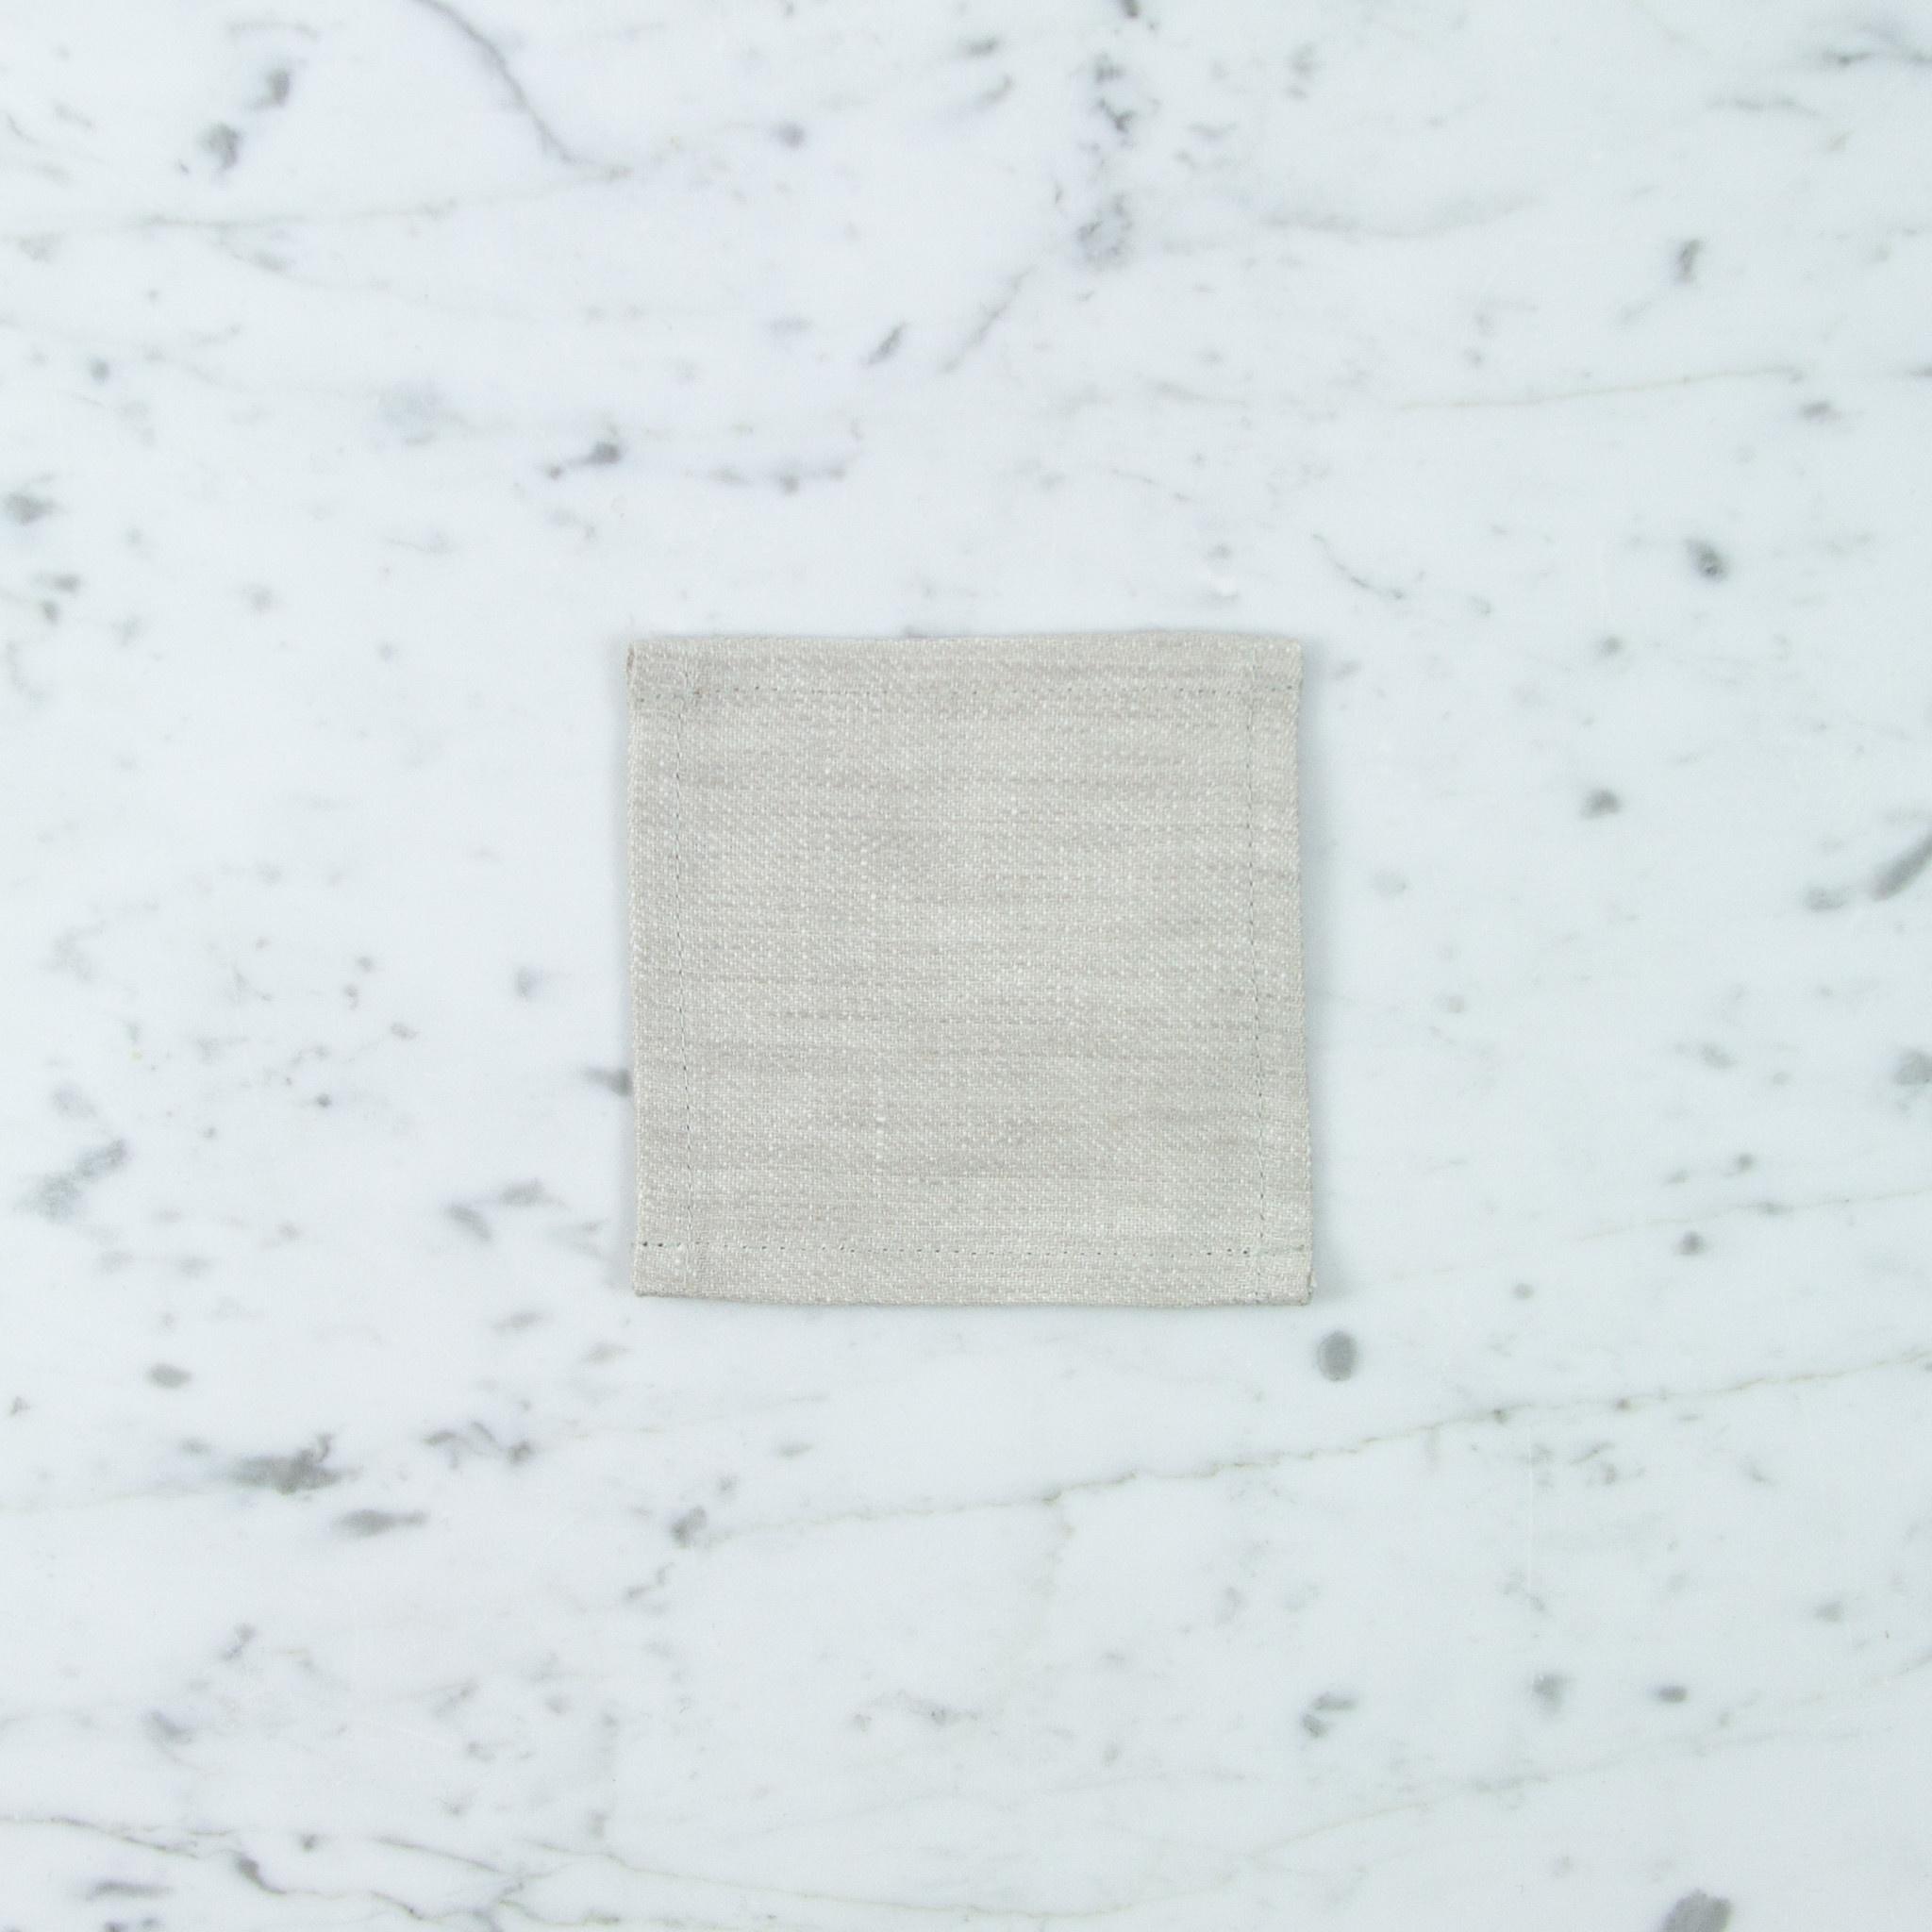 Lithuanian Linen Coaster - Denim White